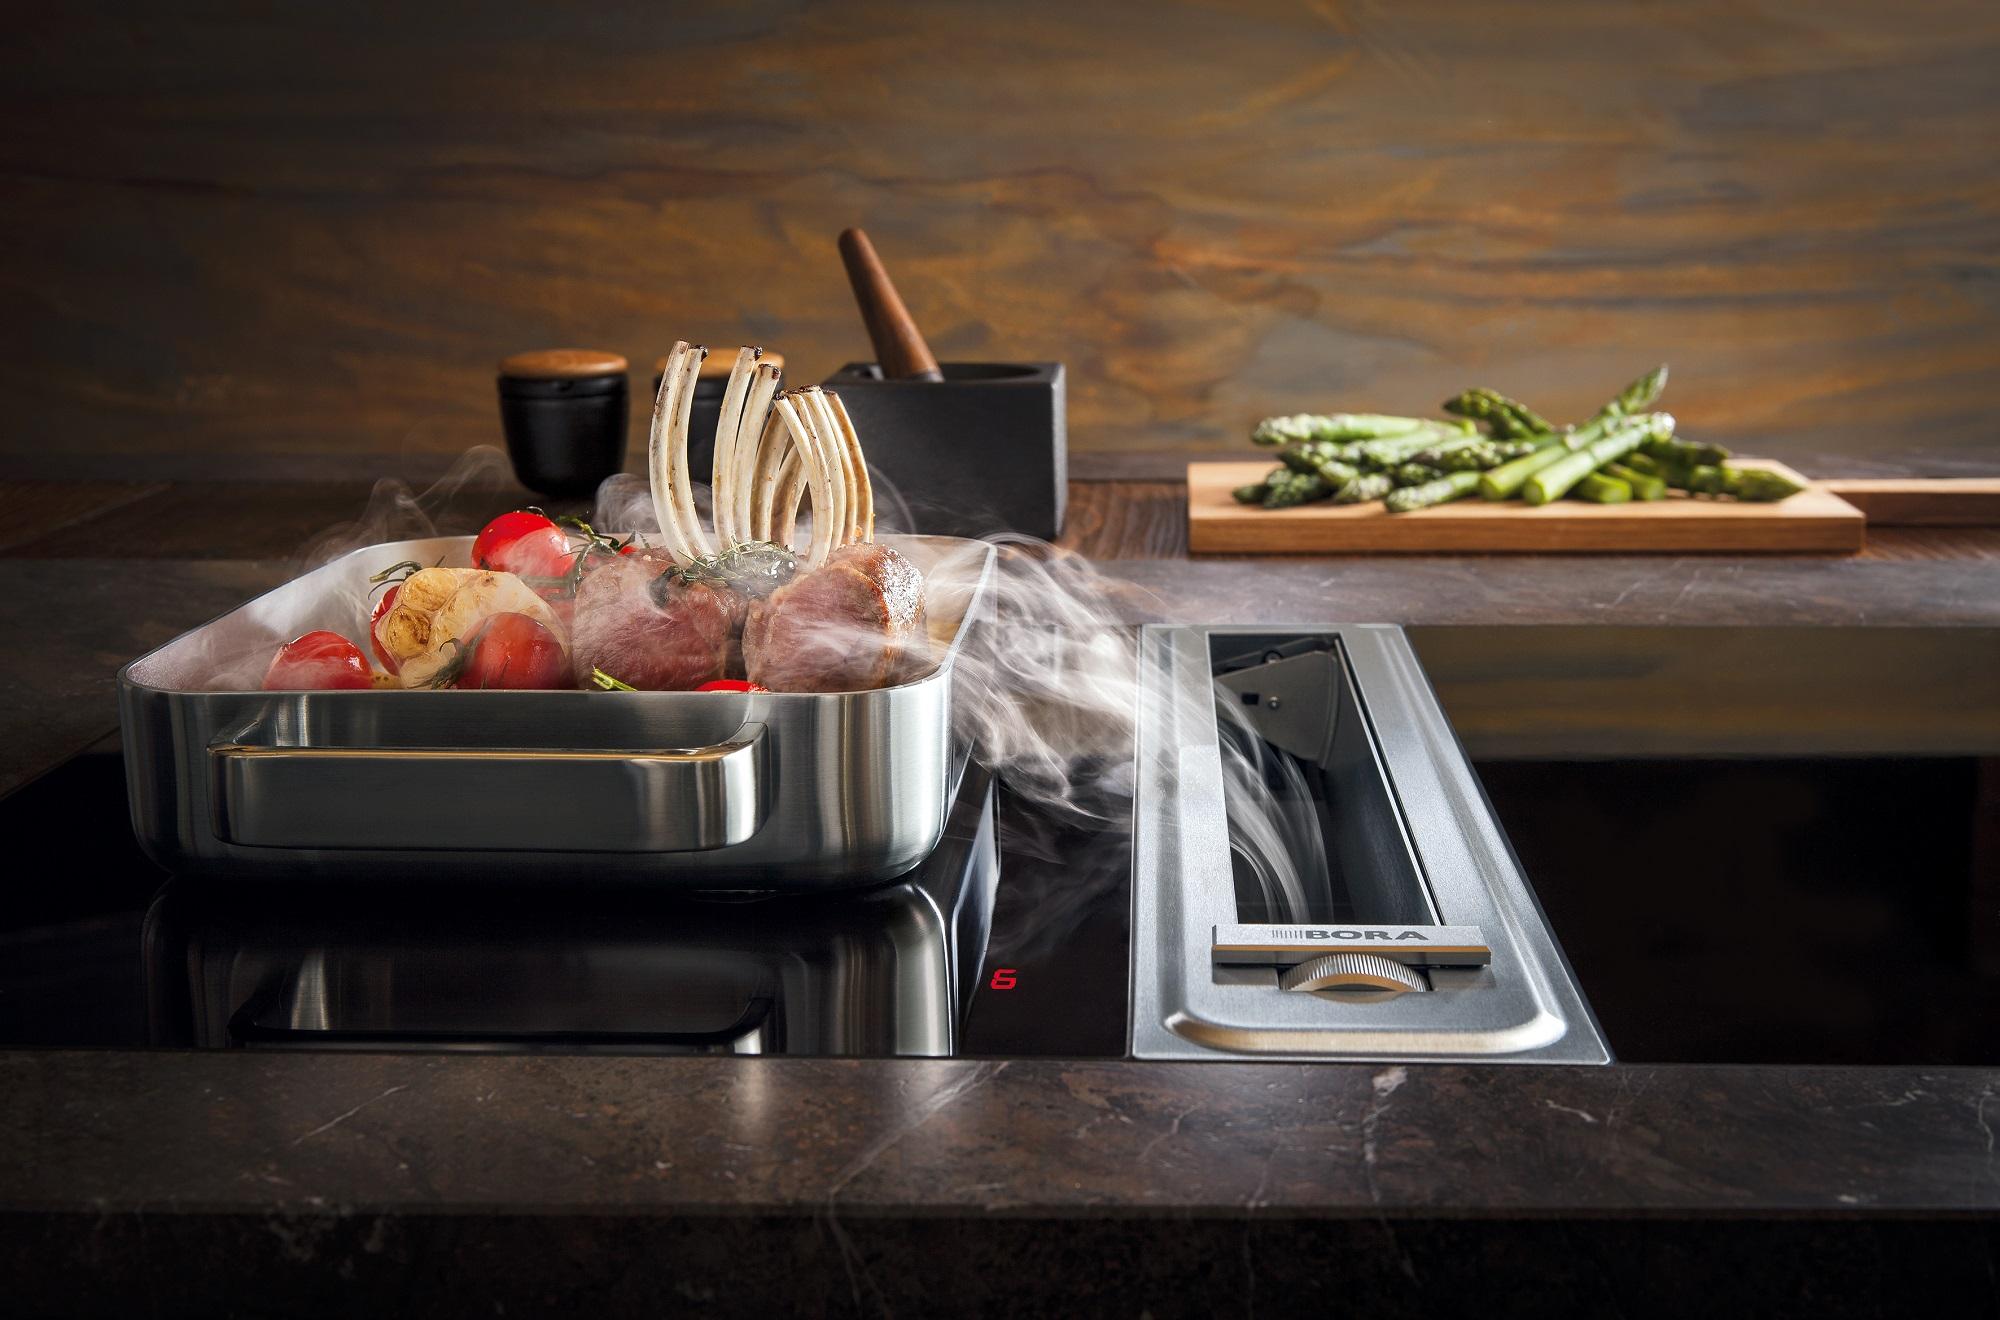 Bora professional kochen auf höchstem niveau area u design